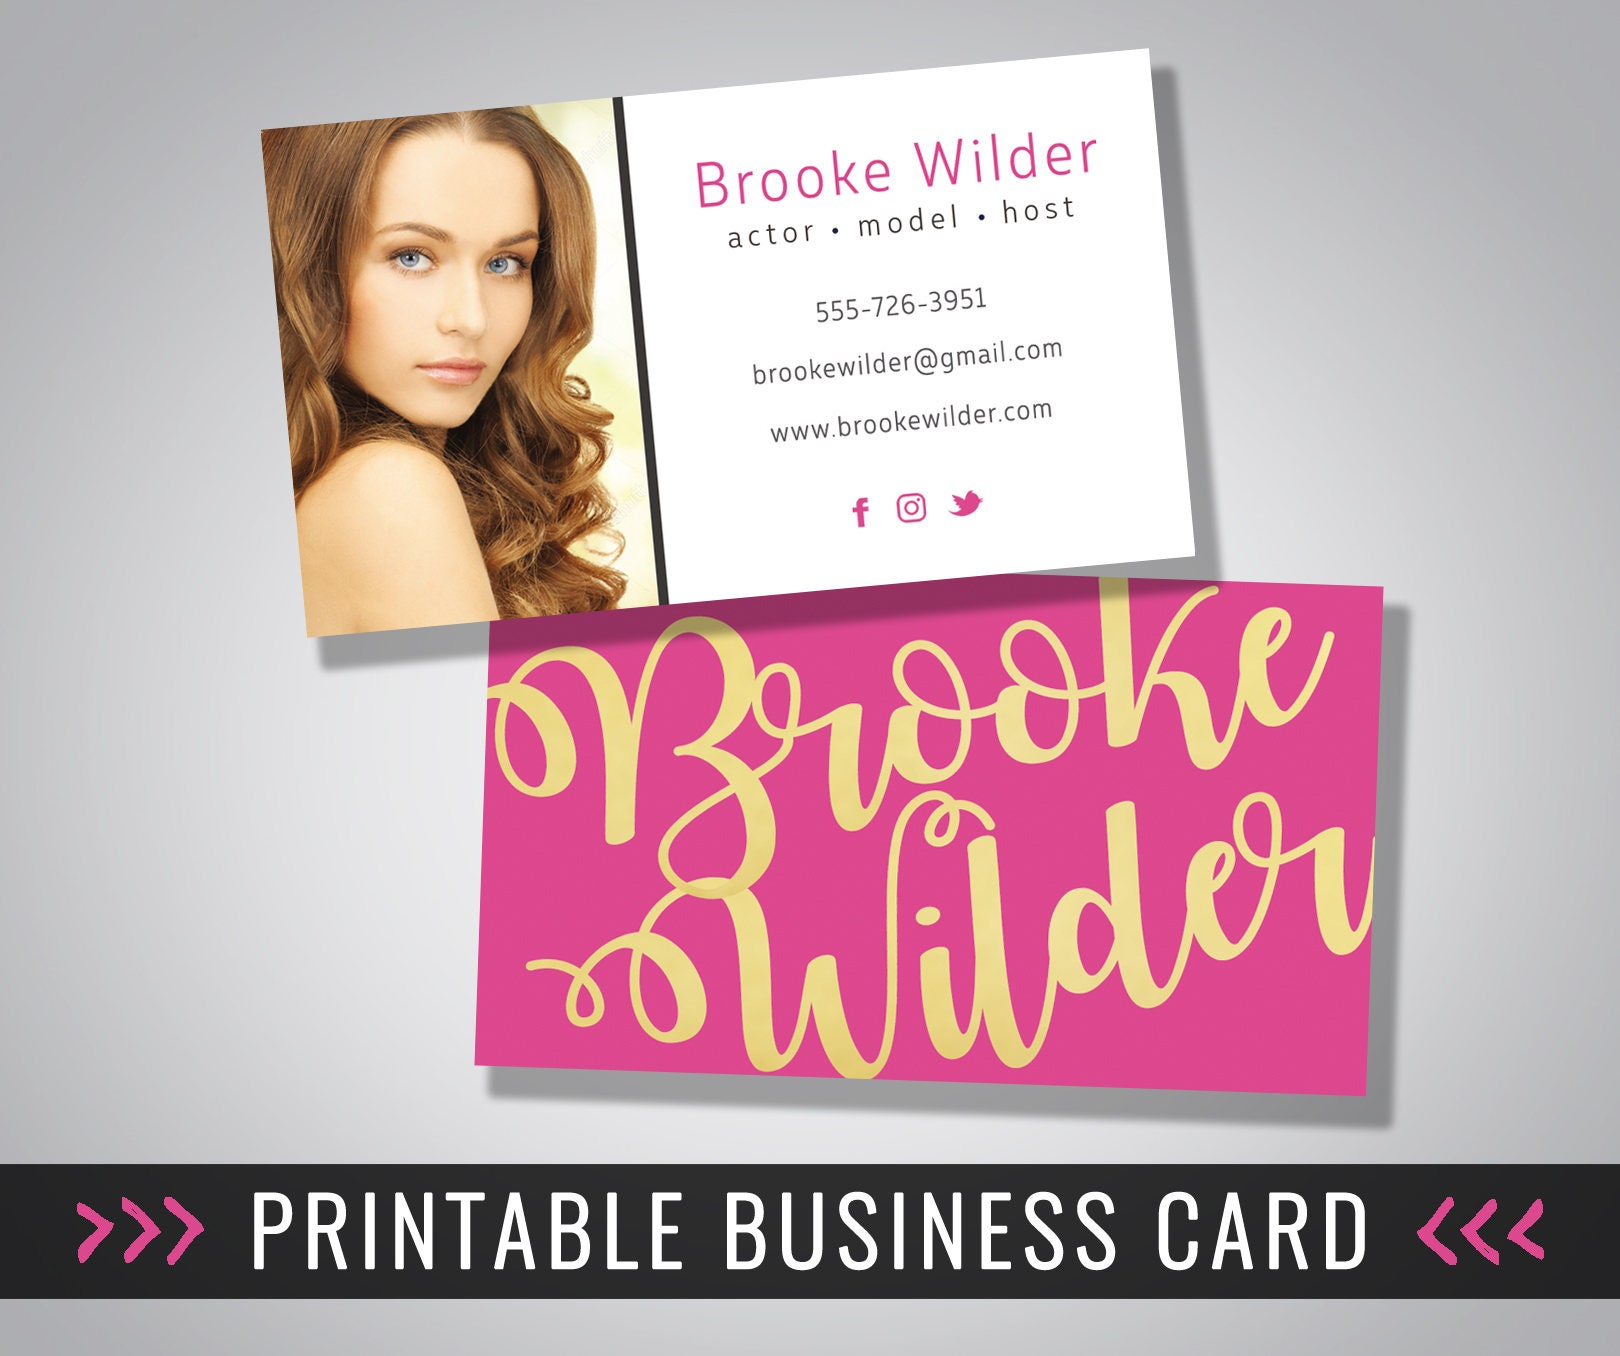 Business Card Design / Photo Business Card / Printable / 3.5 x